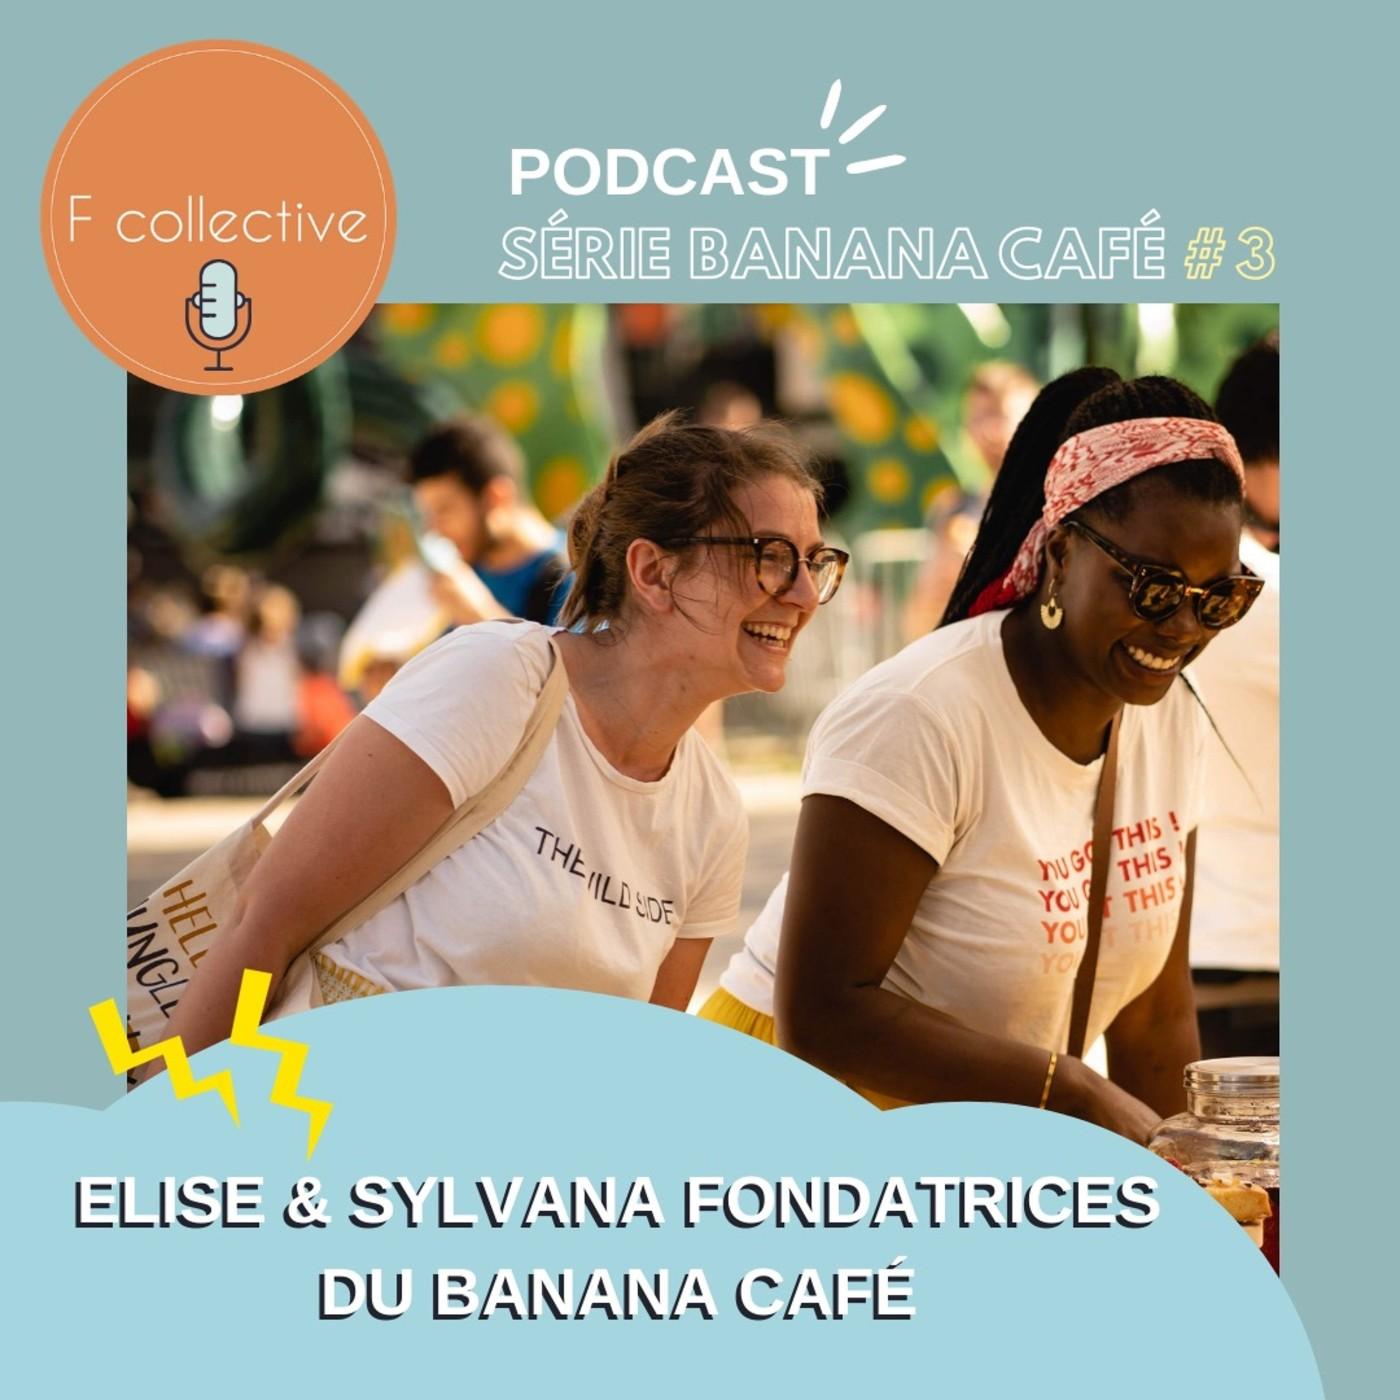 #15 SÉRIE BANANA CAFÉ - Ep 3 - Elise et Sylvana fondatrices du Banana Café (Lille)